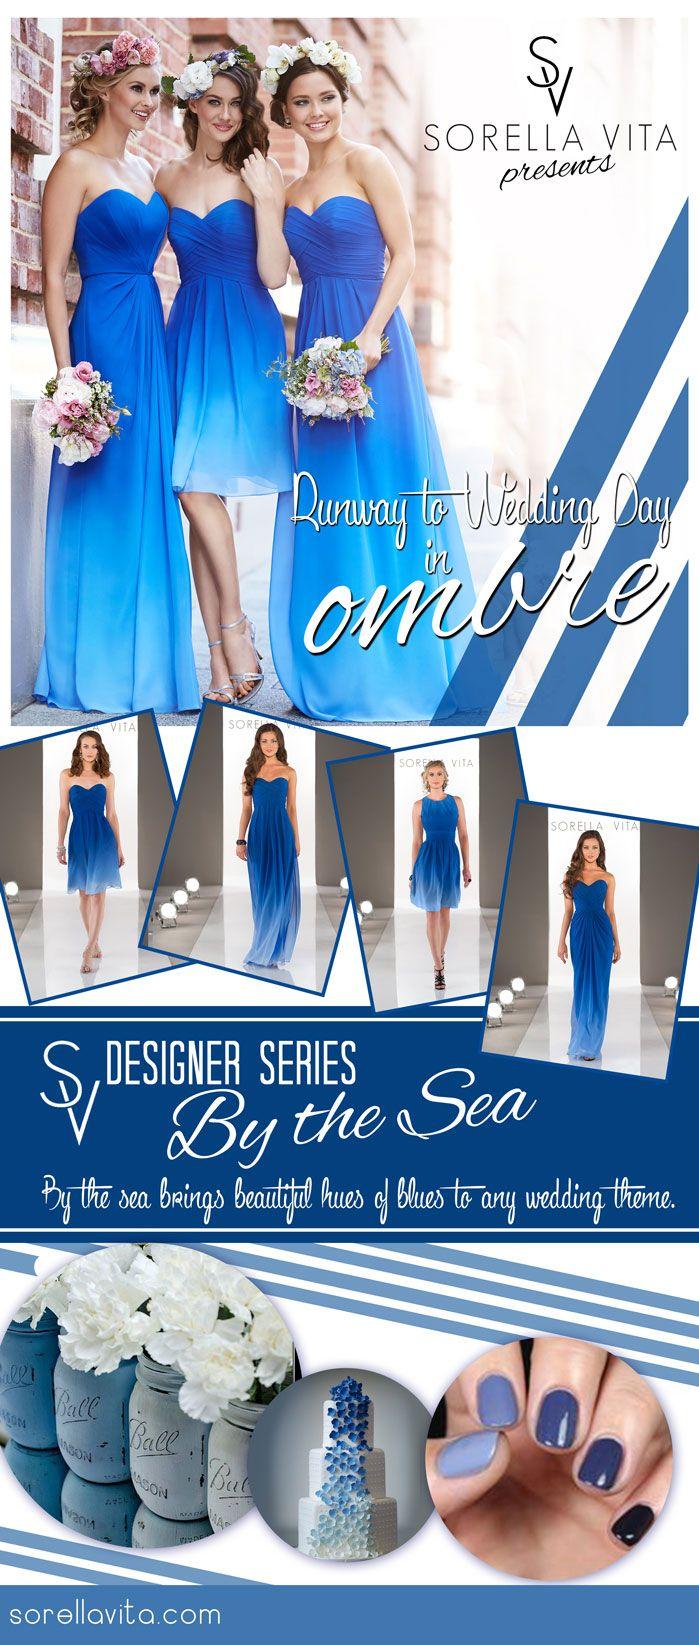 Sorella vita designer series ombre bridesmaiddress available at